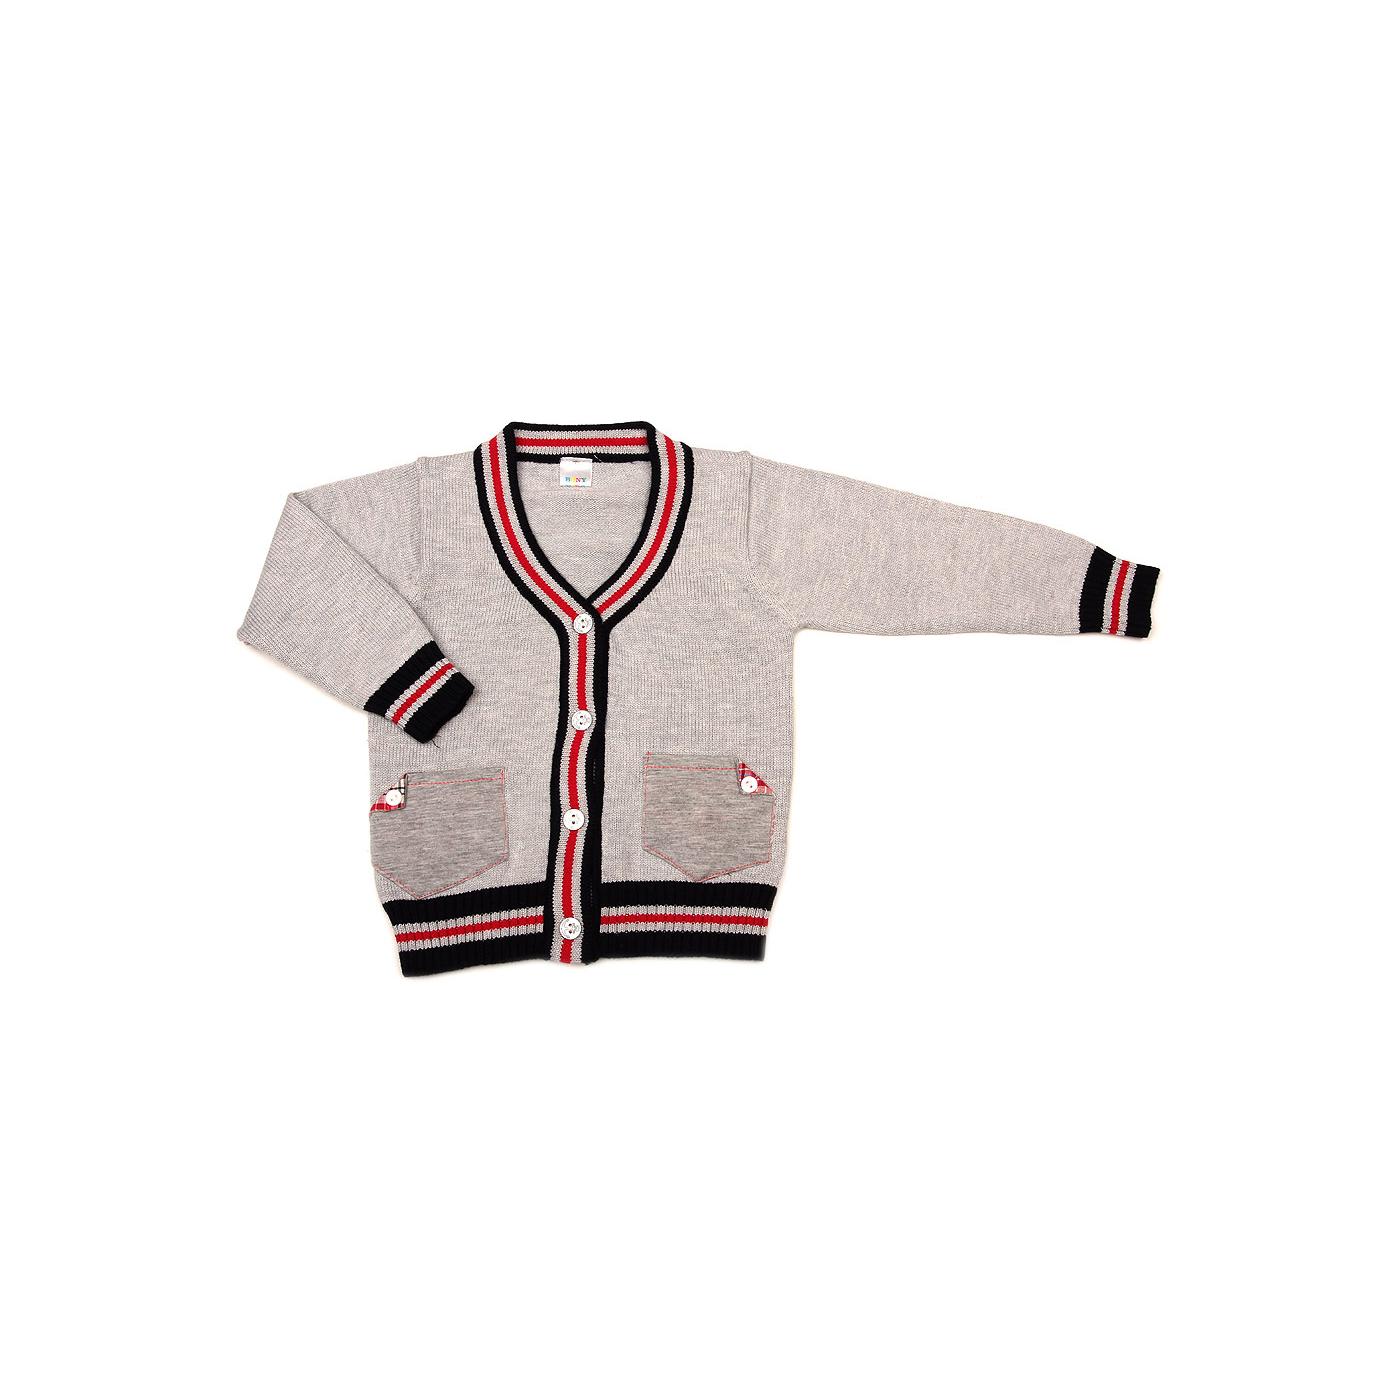 Жакет Bony Kids с карманами, цвет - Серый Размер 80